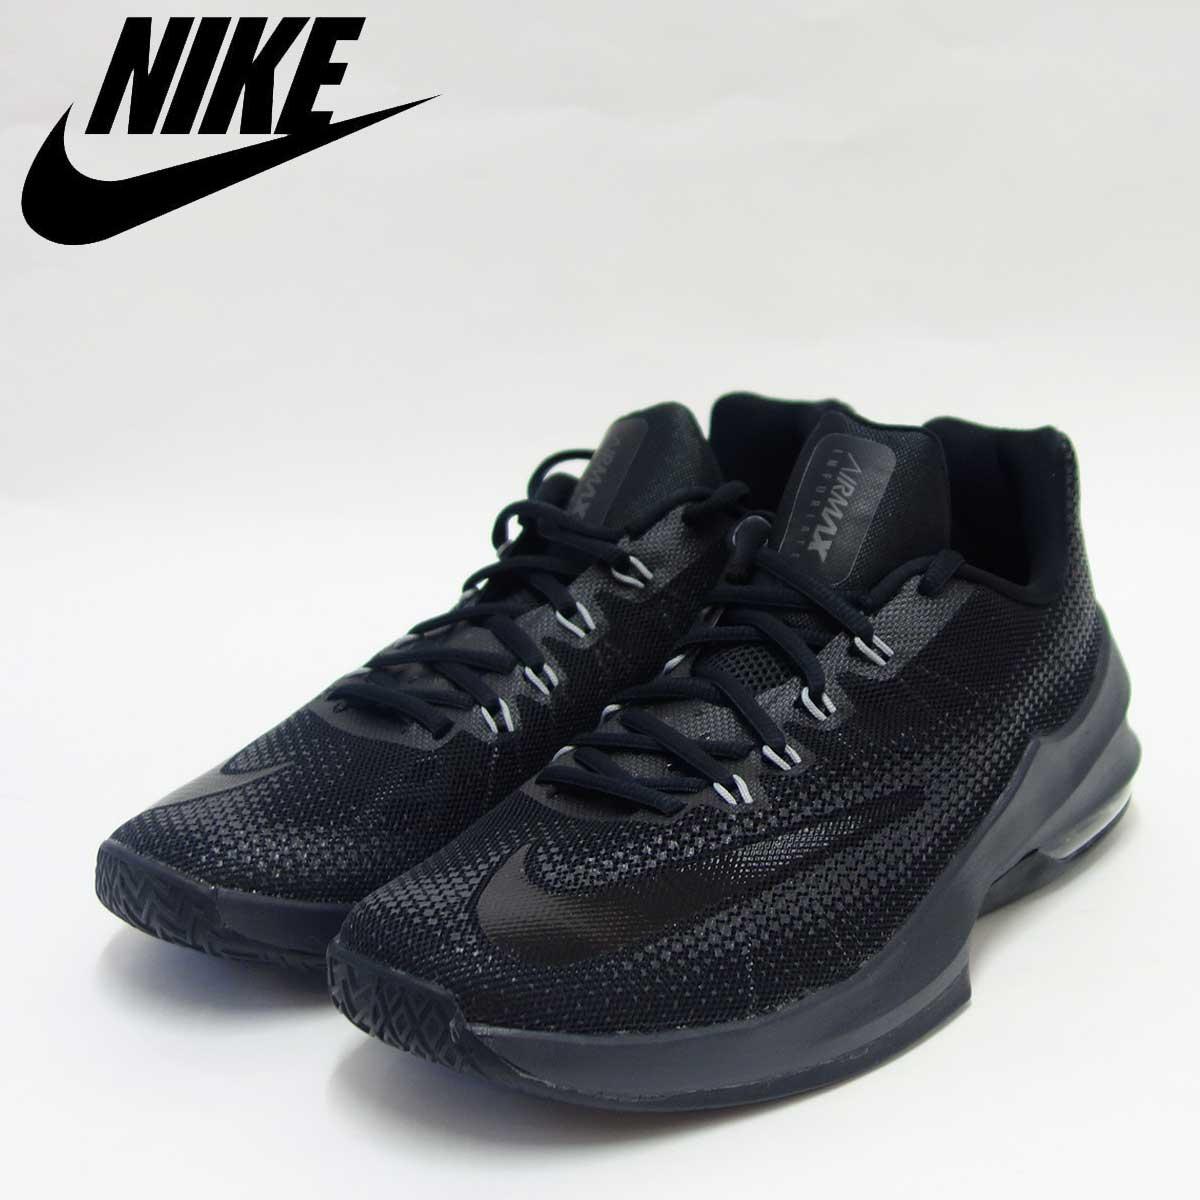 NIKEナイキ852457001ブラックナイキエアマックスインフリエイトLOW(メンズ)NIKEAIRMAXINFURIATELOW「靴」